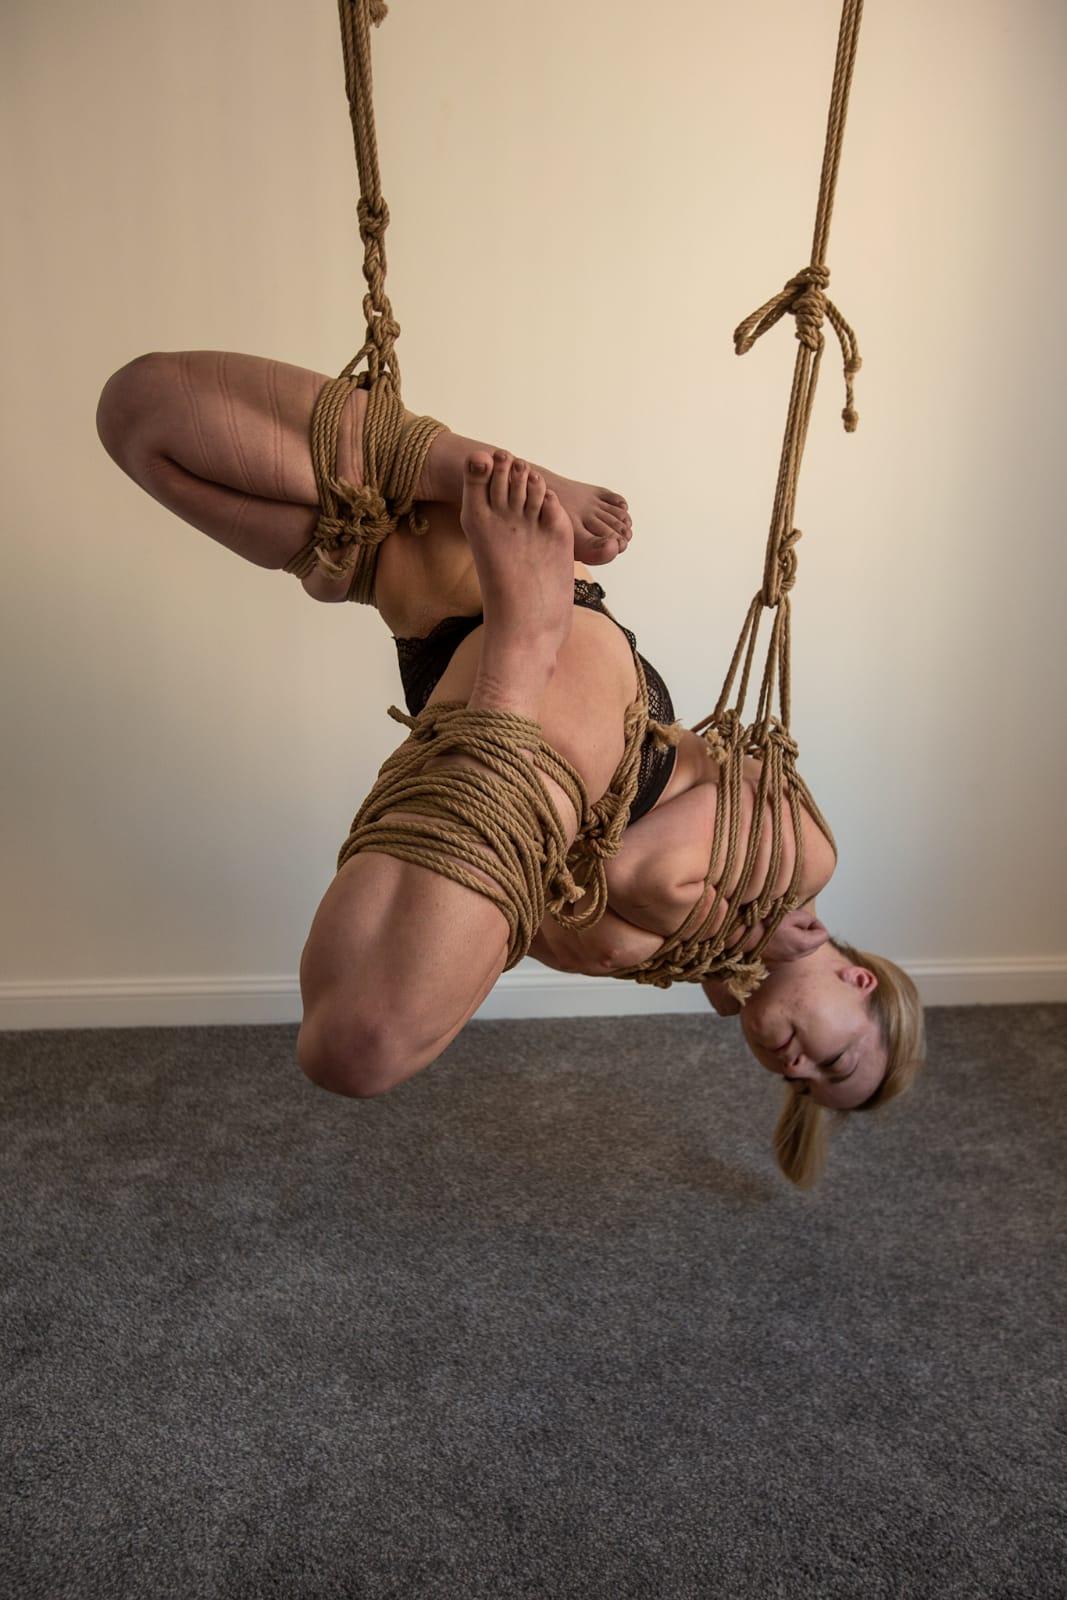 Indoor rope suspension, hanging